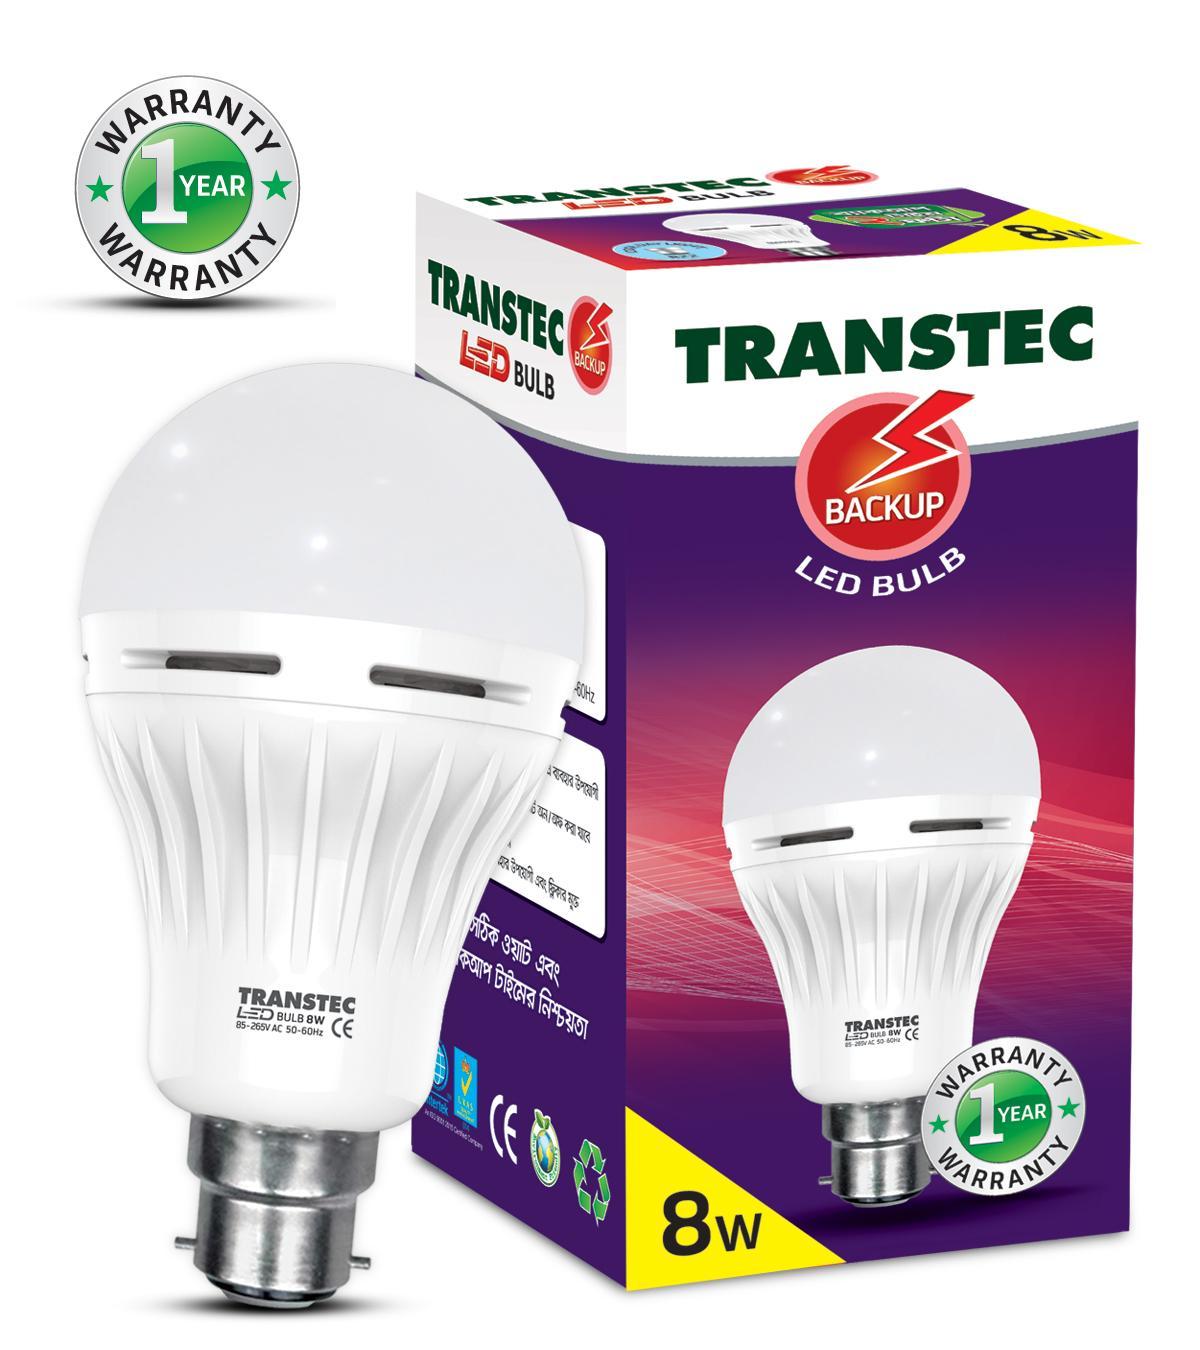 Transtec Smart LED Backup Bulb 8 Watt (E27 - Screw Type)